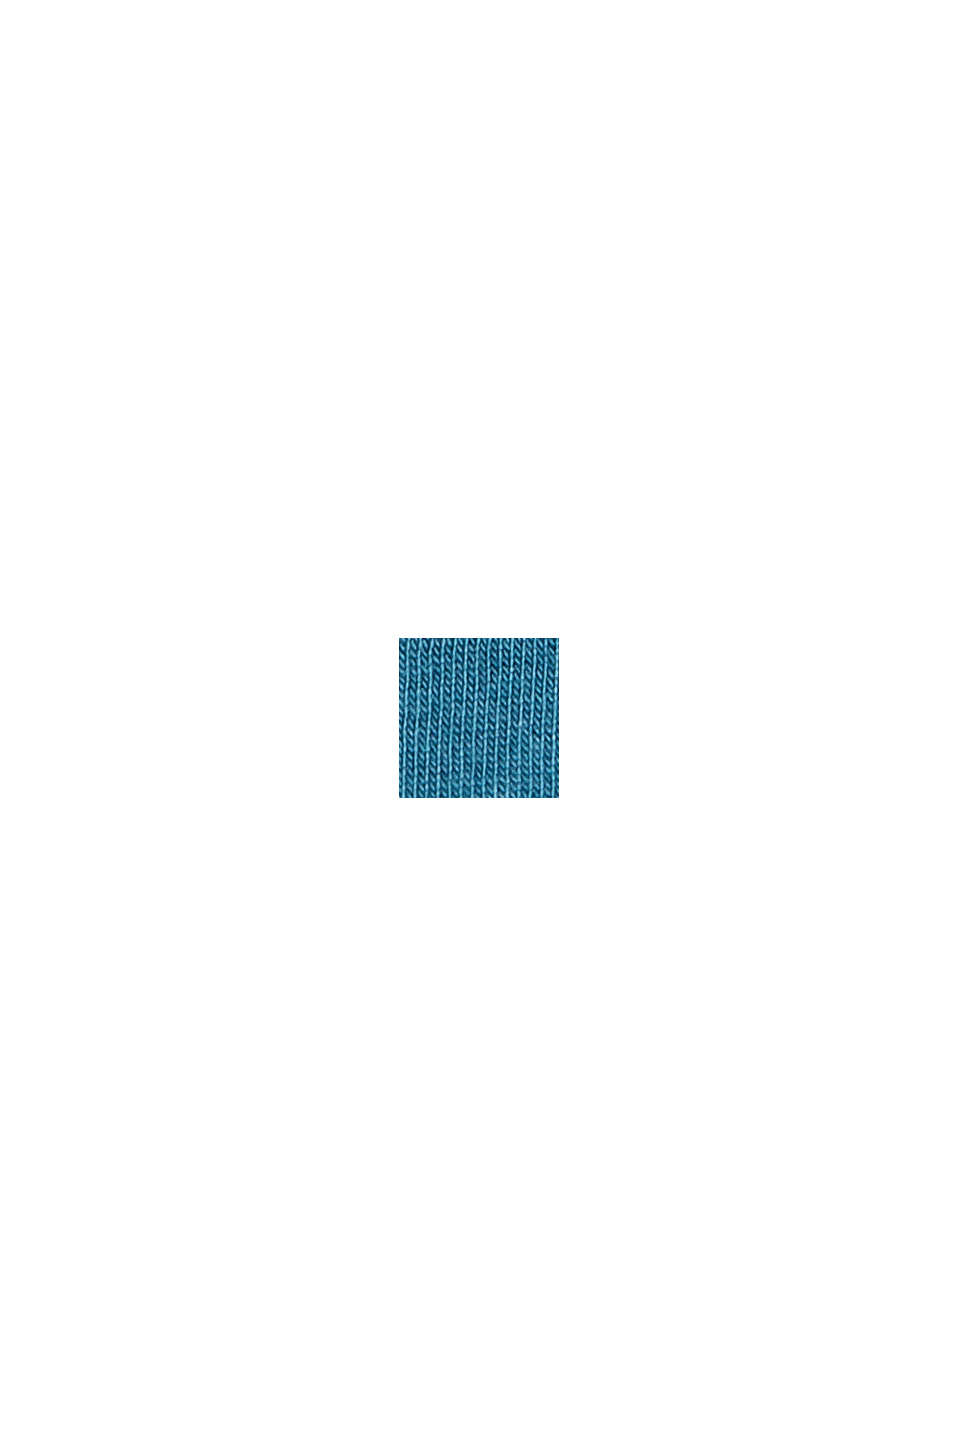 Jersey sleeveless top, 100% organic cotton, PETROL BLUE, swatch